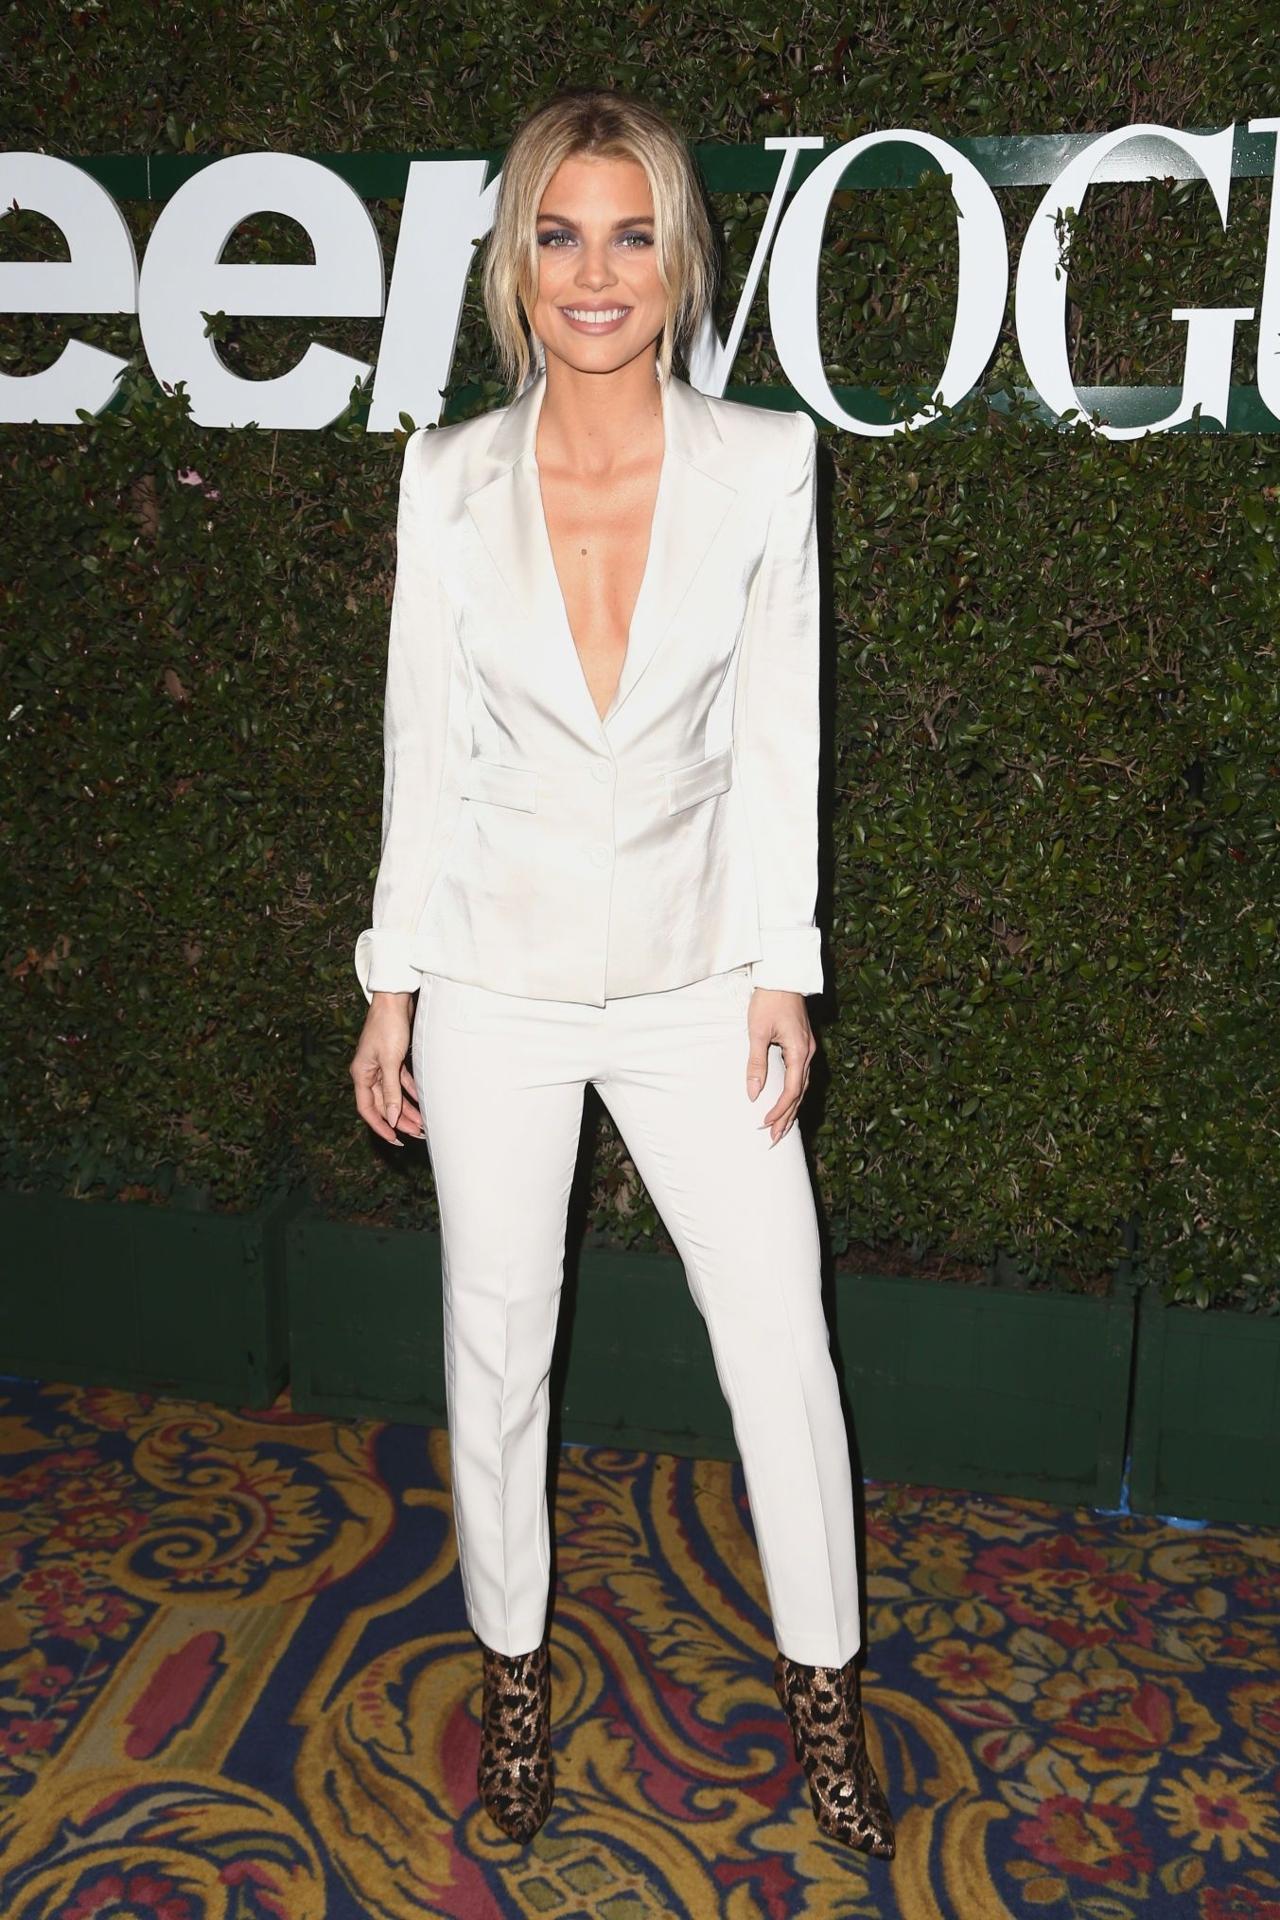 jacket pants white blazer blazer suit celebrity annalynne mccord